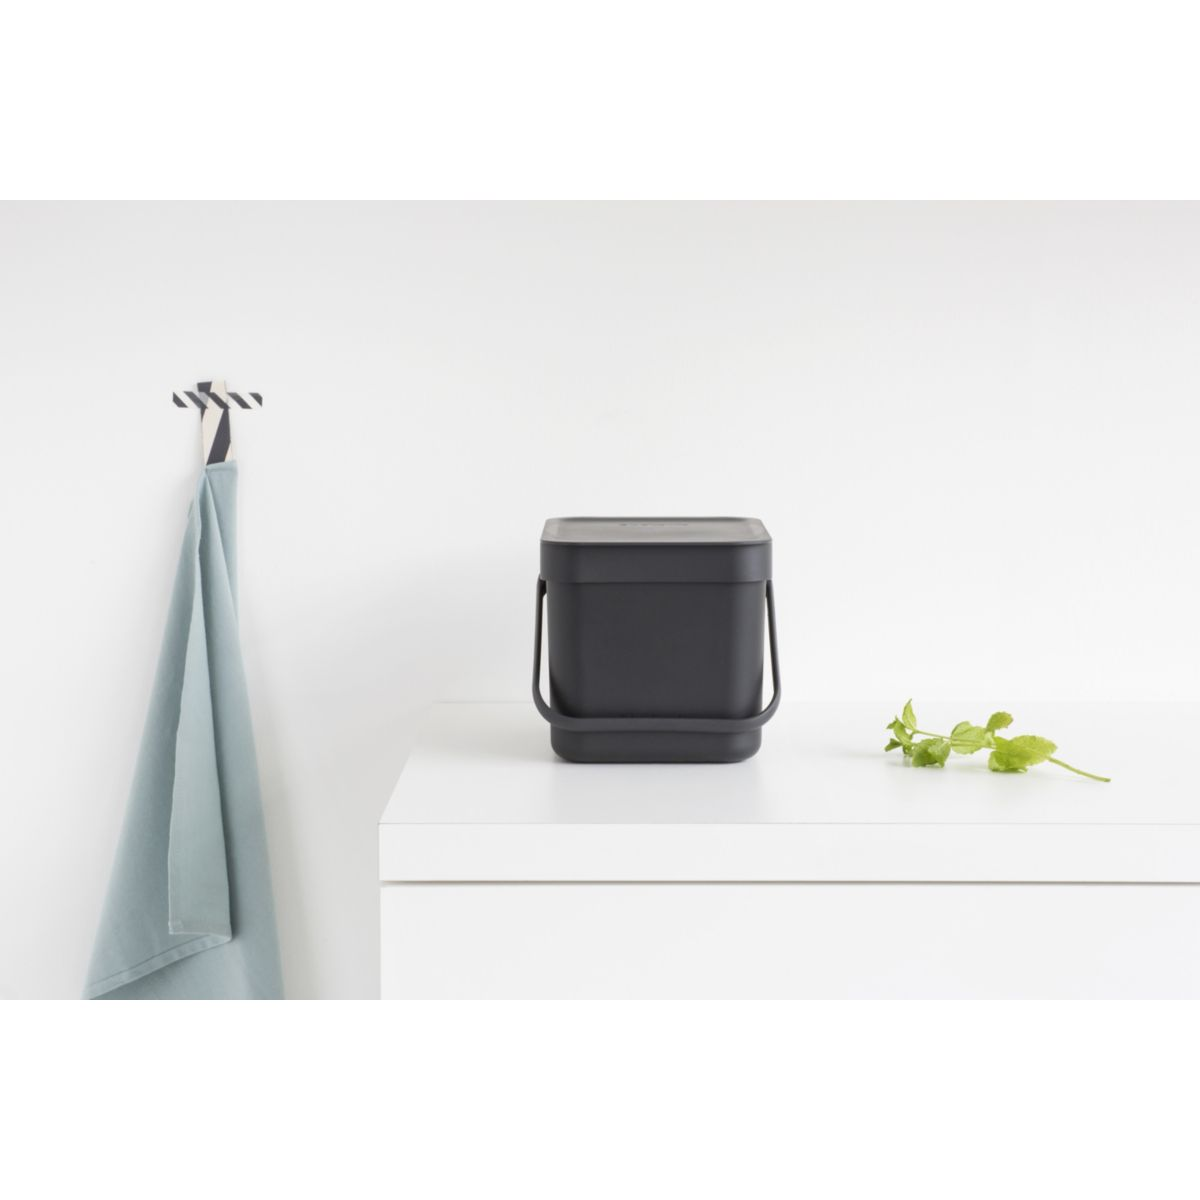 Poubelle manuelle BRABANTIA Waste Bin Sort & Go 6L Grey (photo)